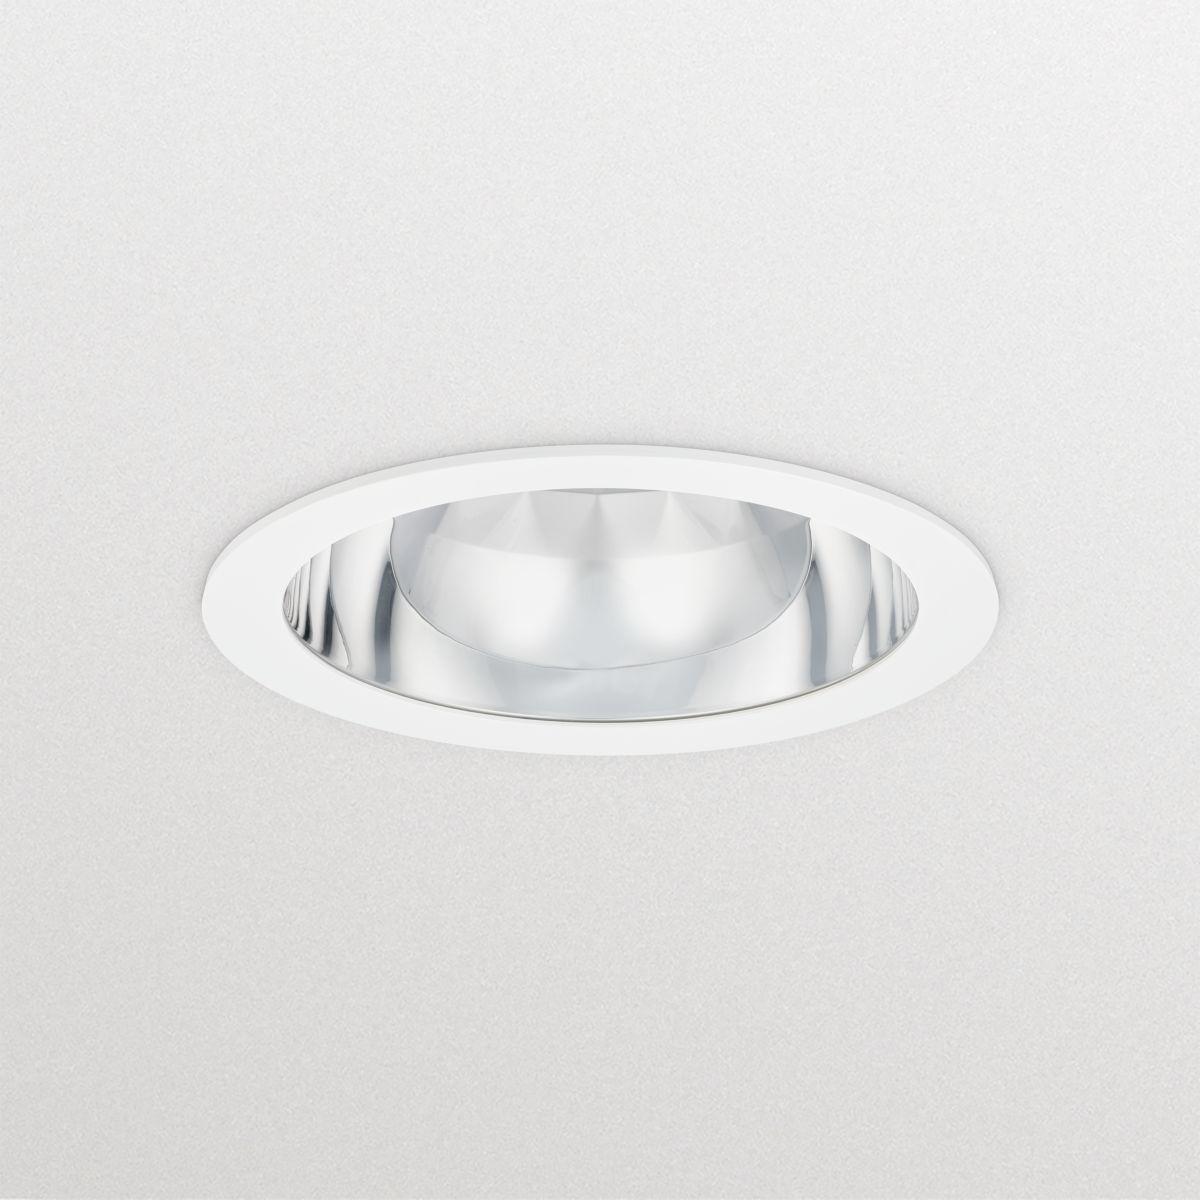 Greenspace Downlights Philips Lighting Light Fixtures Pinhole On Wiring Halogen Lights In Series